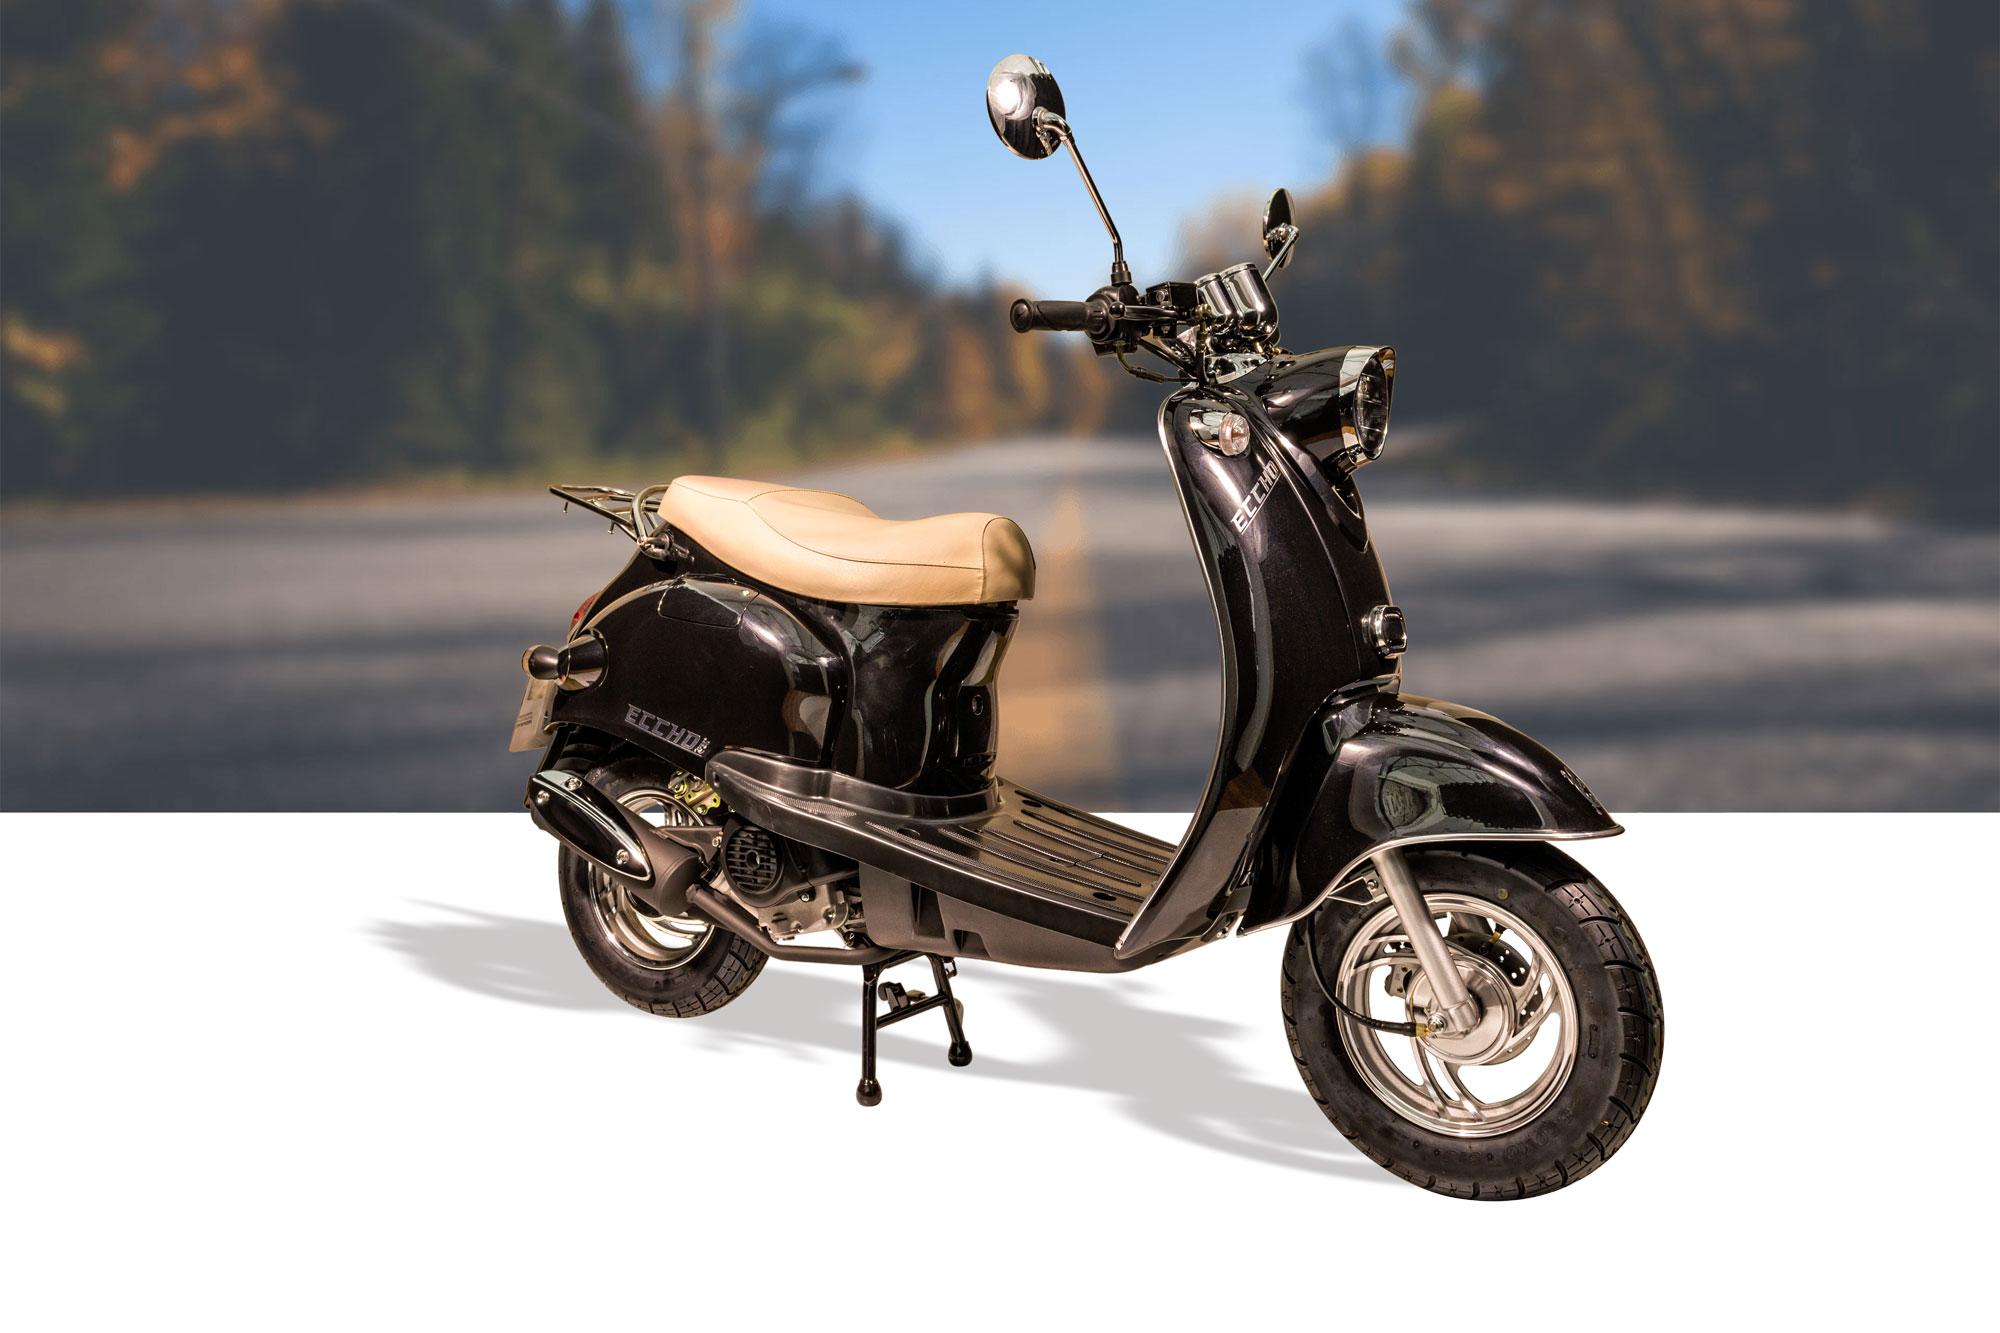 scooter ty50qt k retro scooters eccho cholet acheter. Black Bedroom Furniture Sets. Home Design Ideas